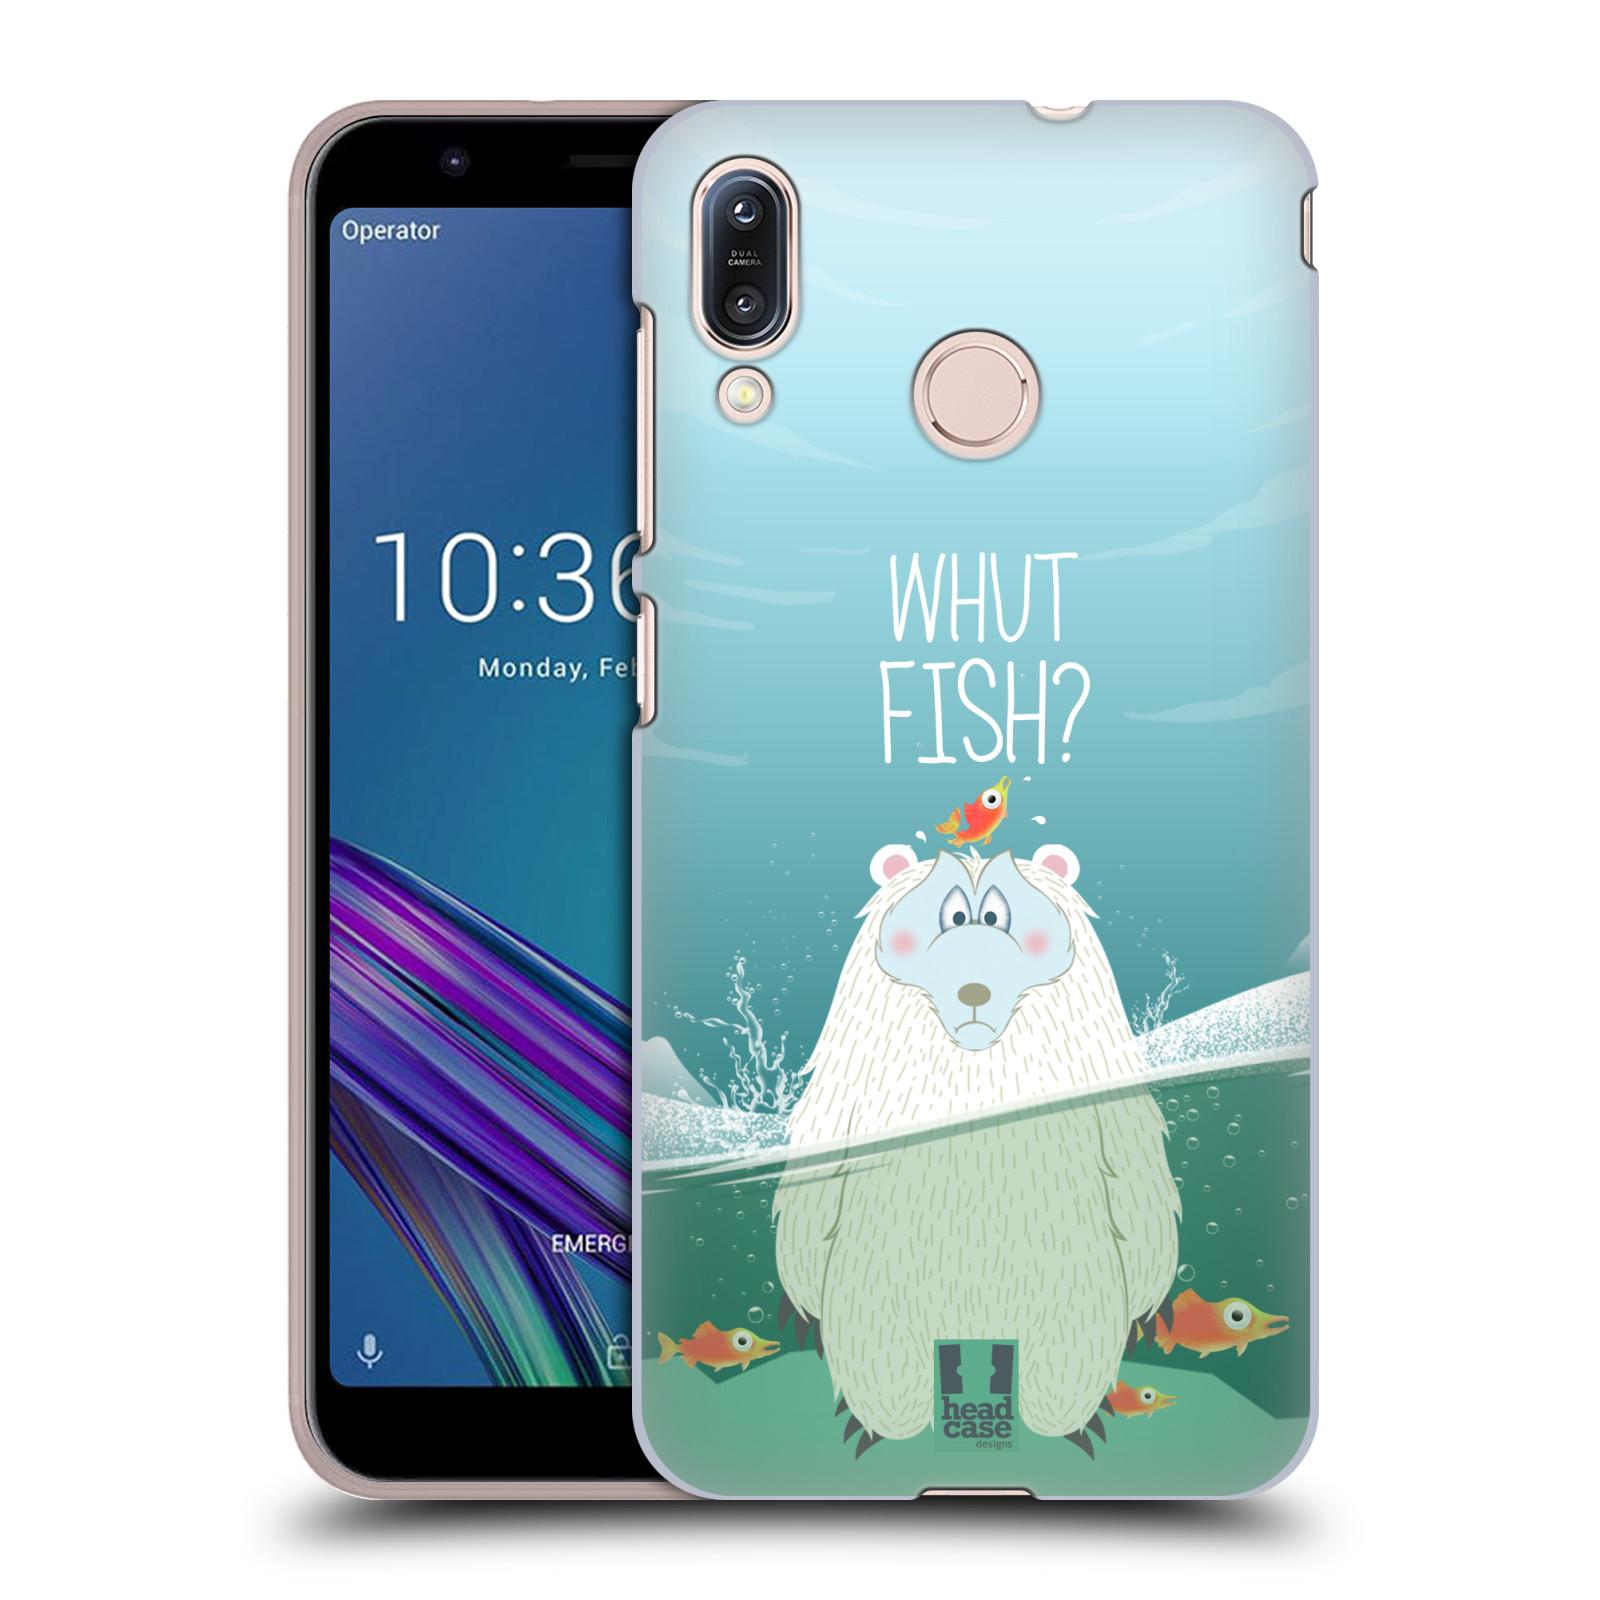 Plastové pouzdro na mobil Asus Zenfone Max M1 ZB555KL - Head Case - Medvěd Whut Fish?